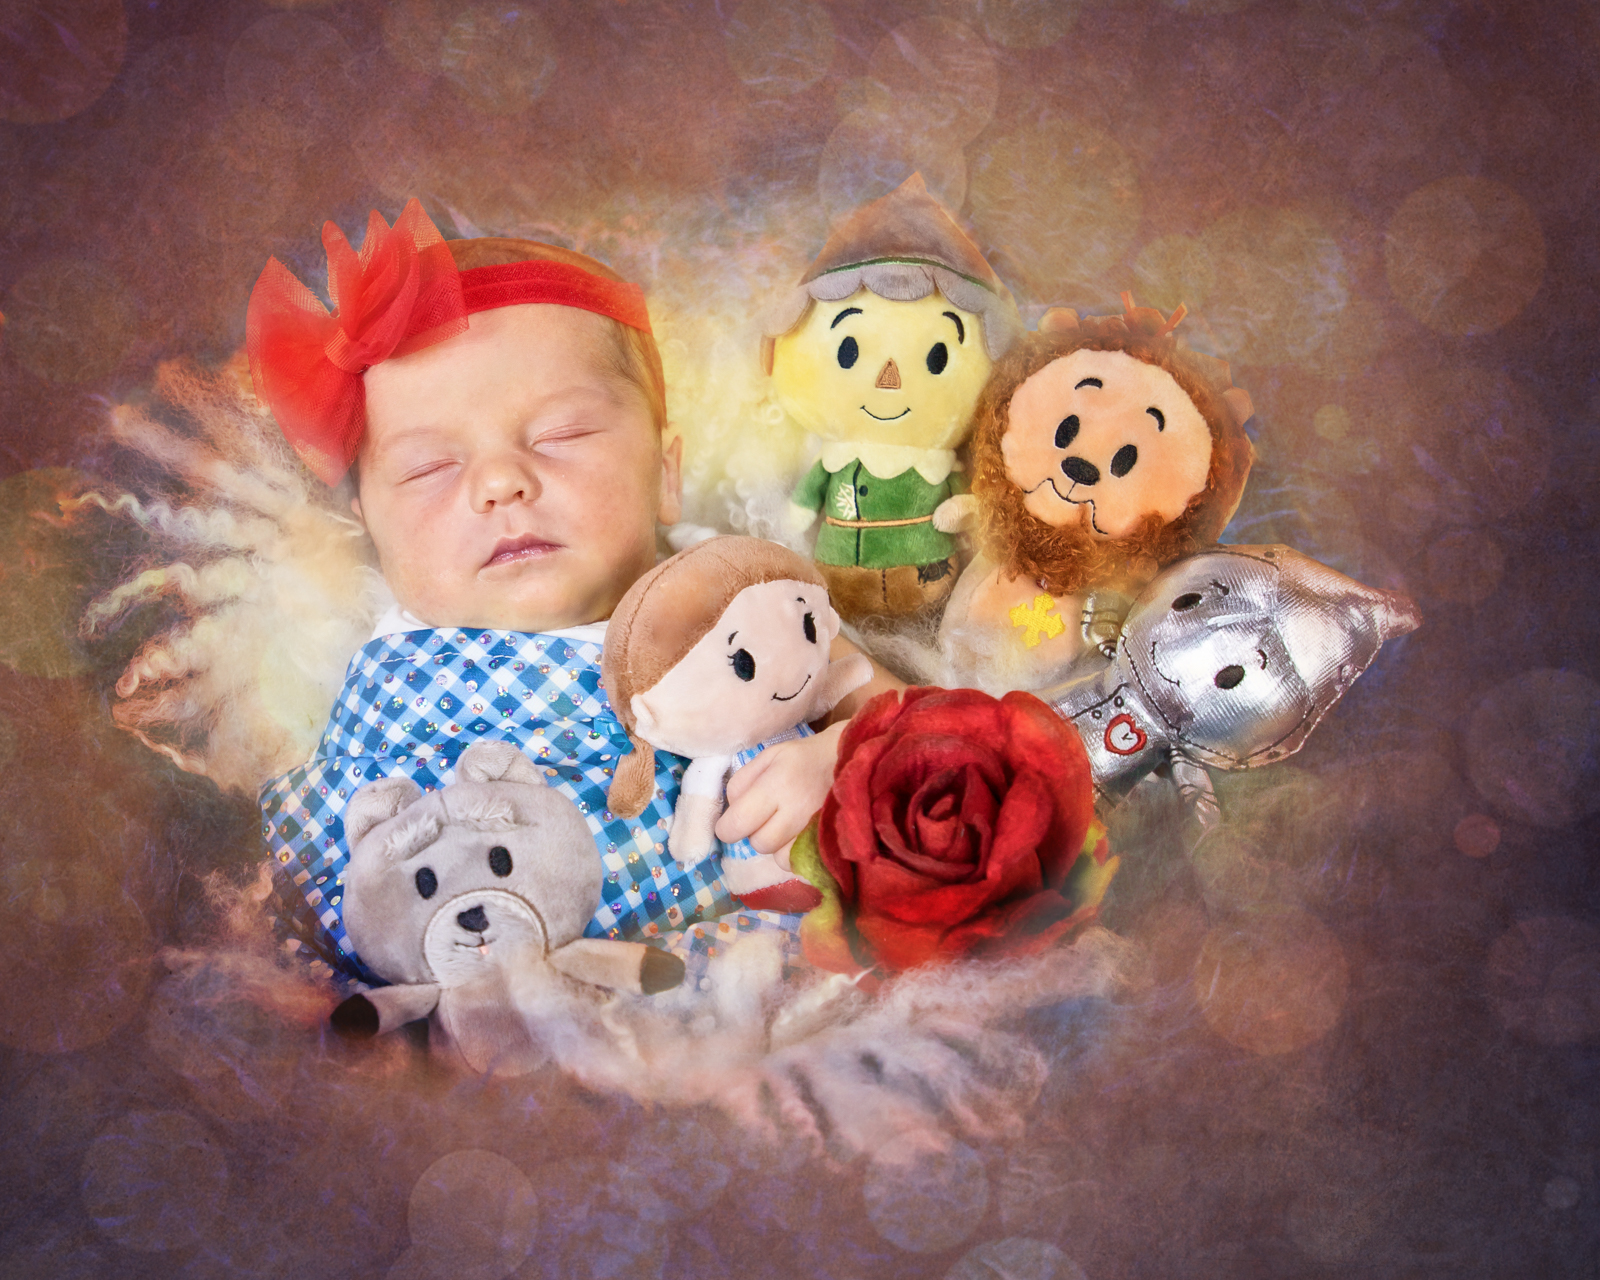 Evangeline Newborn Session April 3rd 2019-0006.jpg